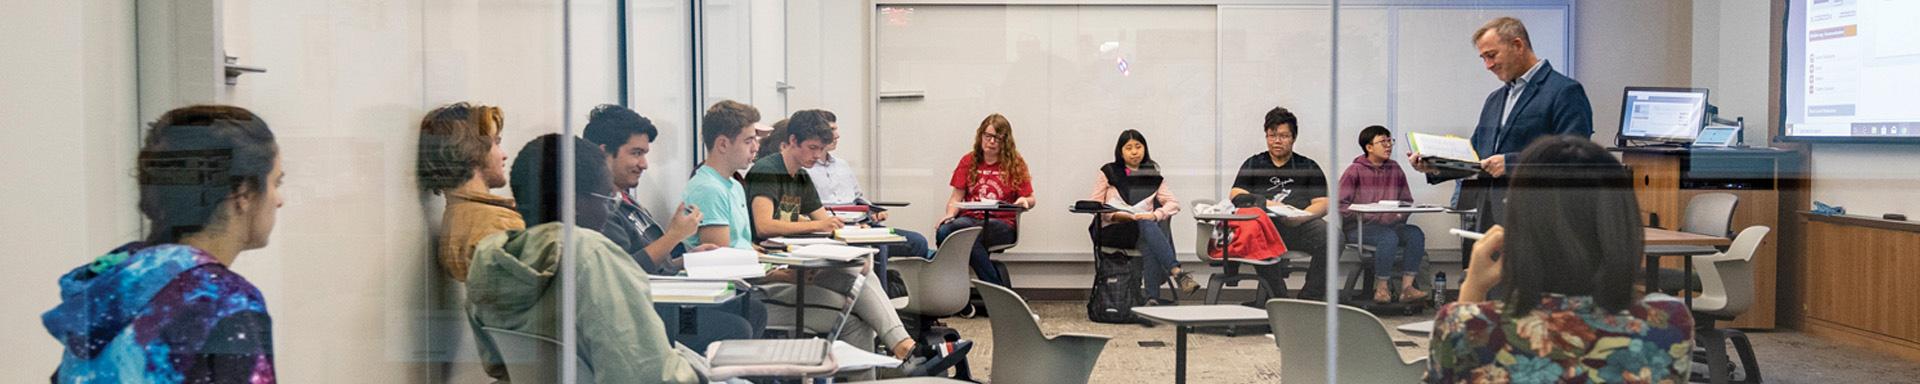 Dan Reynolds, Seth Richards professor in modern languages, leads a German class in the HSSC.